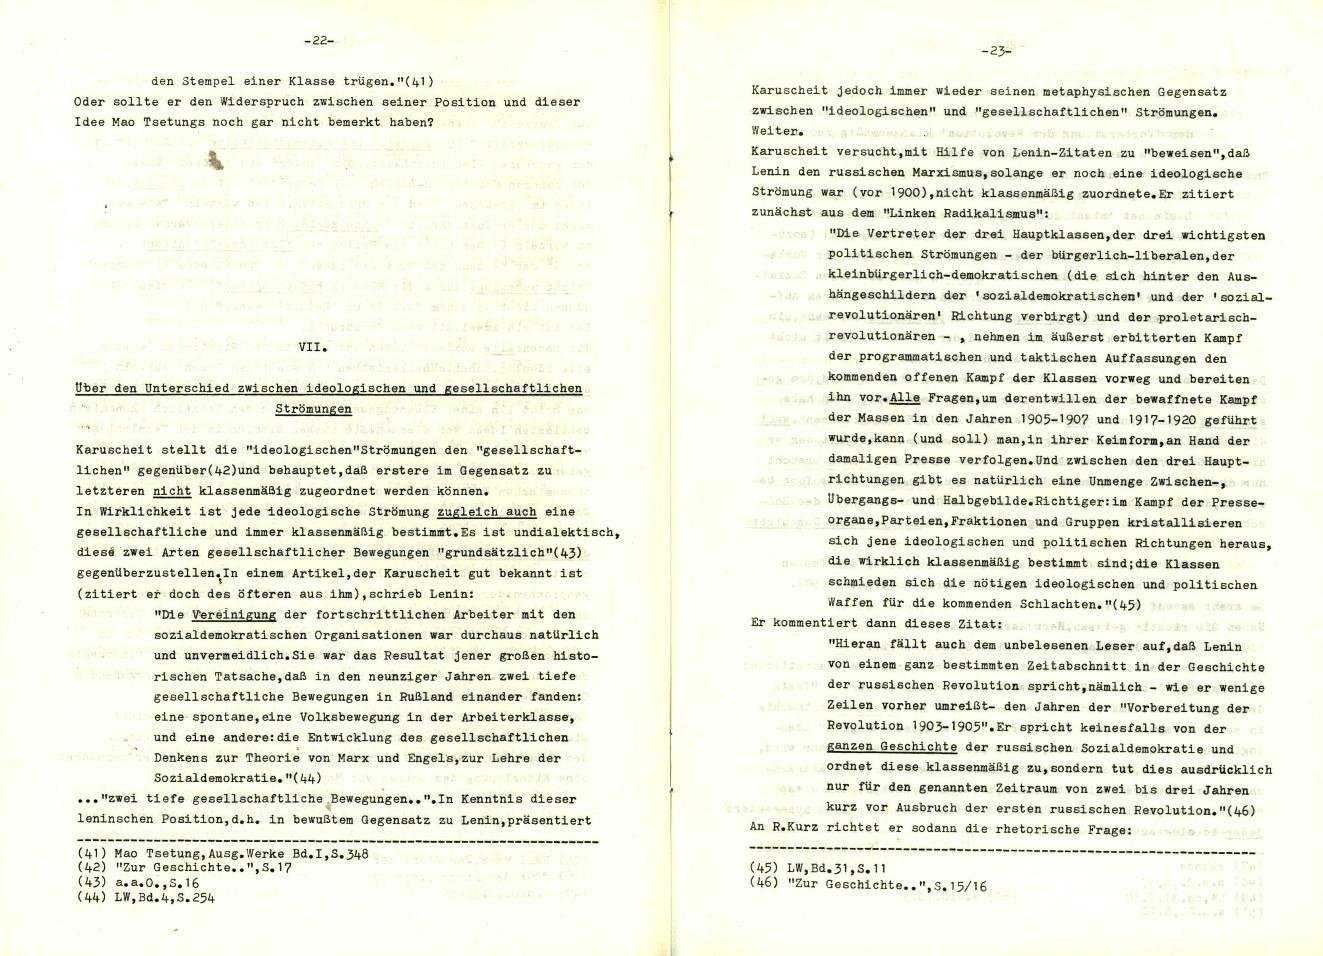 Muenchen_Kampf_dem_Revisionismus_1979_09_12